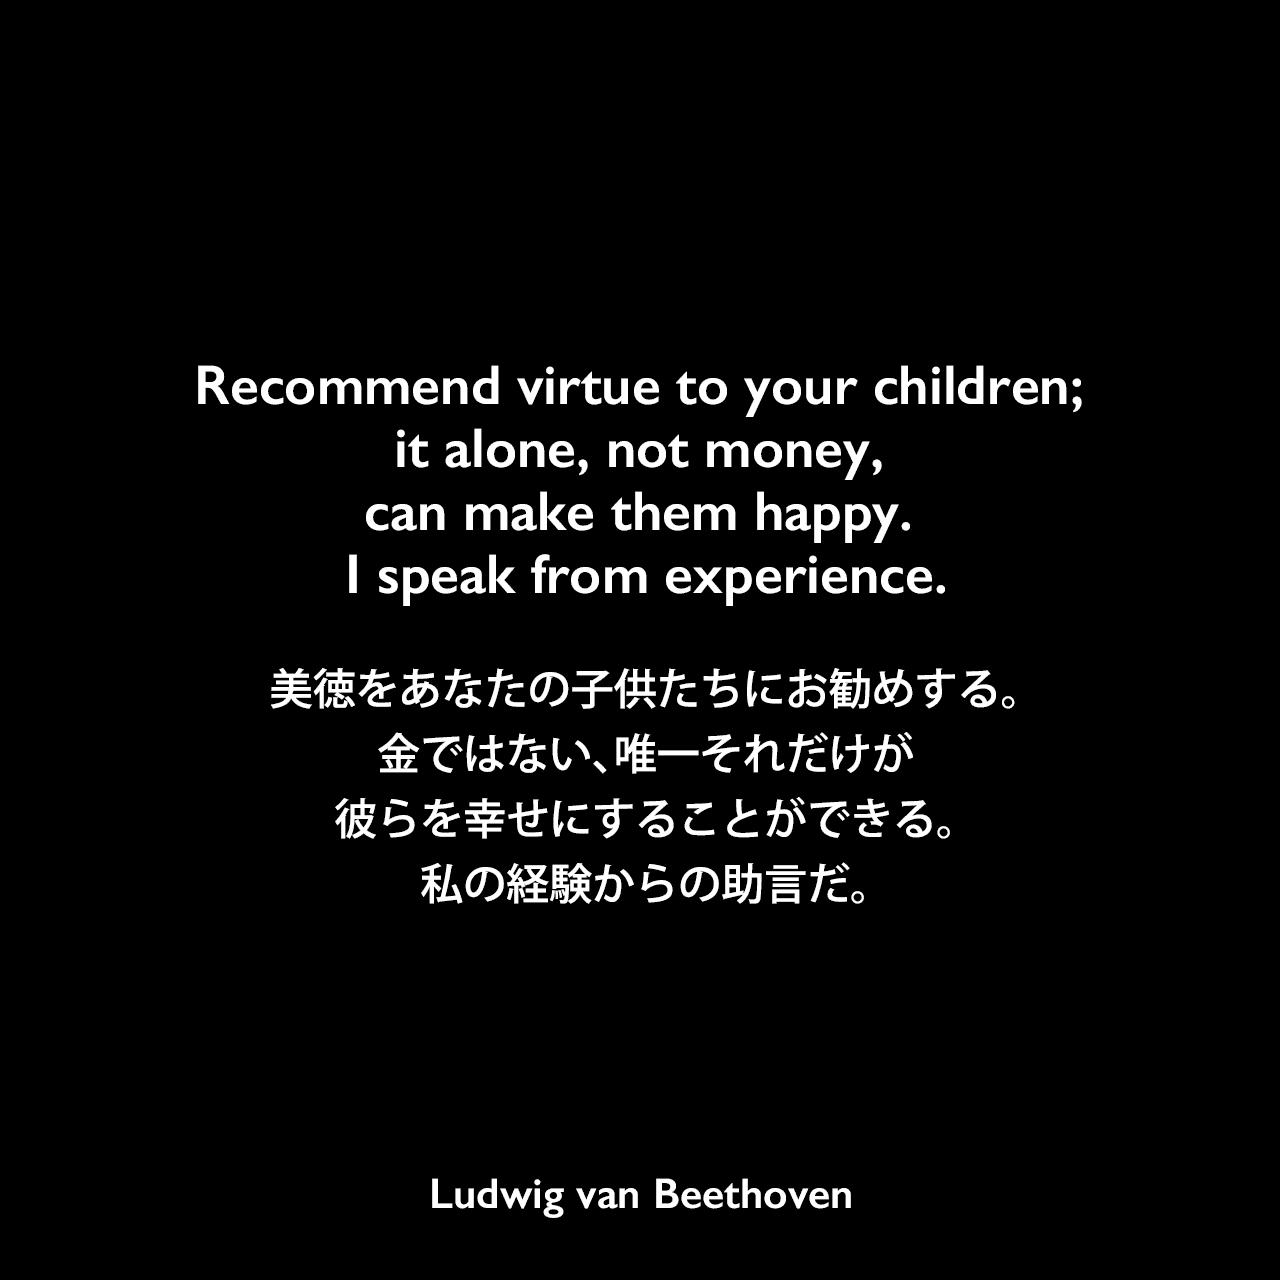 Recommend virtue to your children; it alone, not money, can make them happy. I speak from experience.美徳をあなたの子供たちにお勧めする。金ではない、唯一それだけが彼らを幸せにすることができる。私の経験からの助言だ。Ludwig van Beethoven